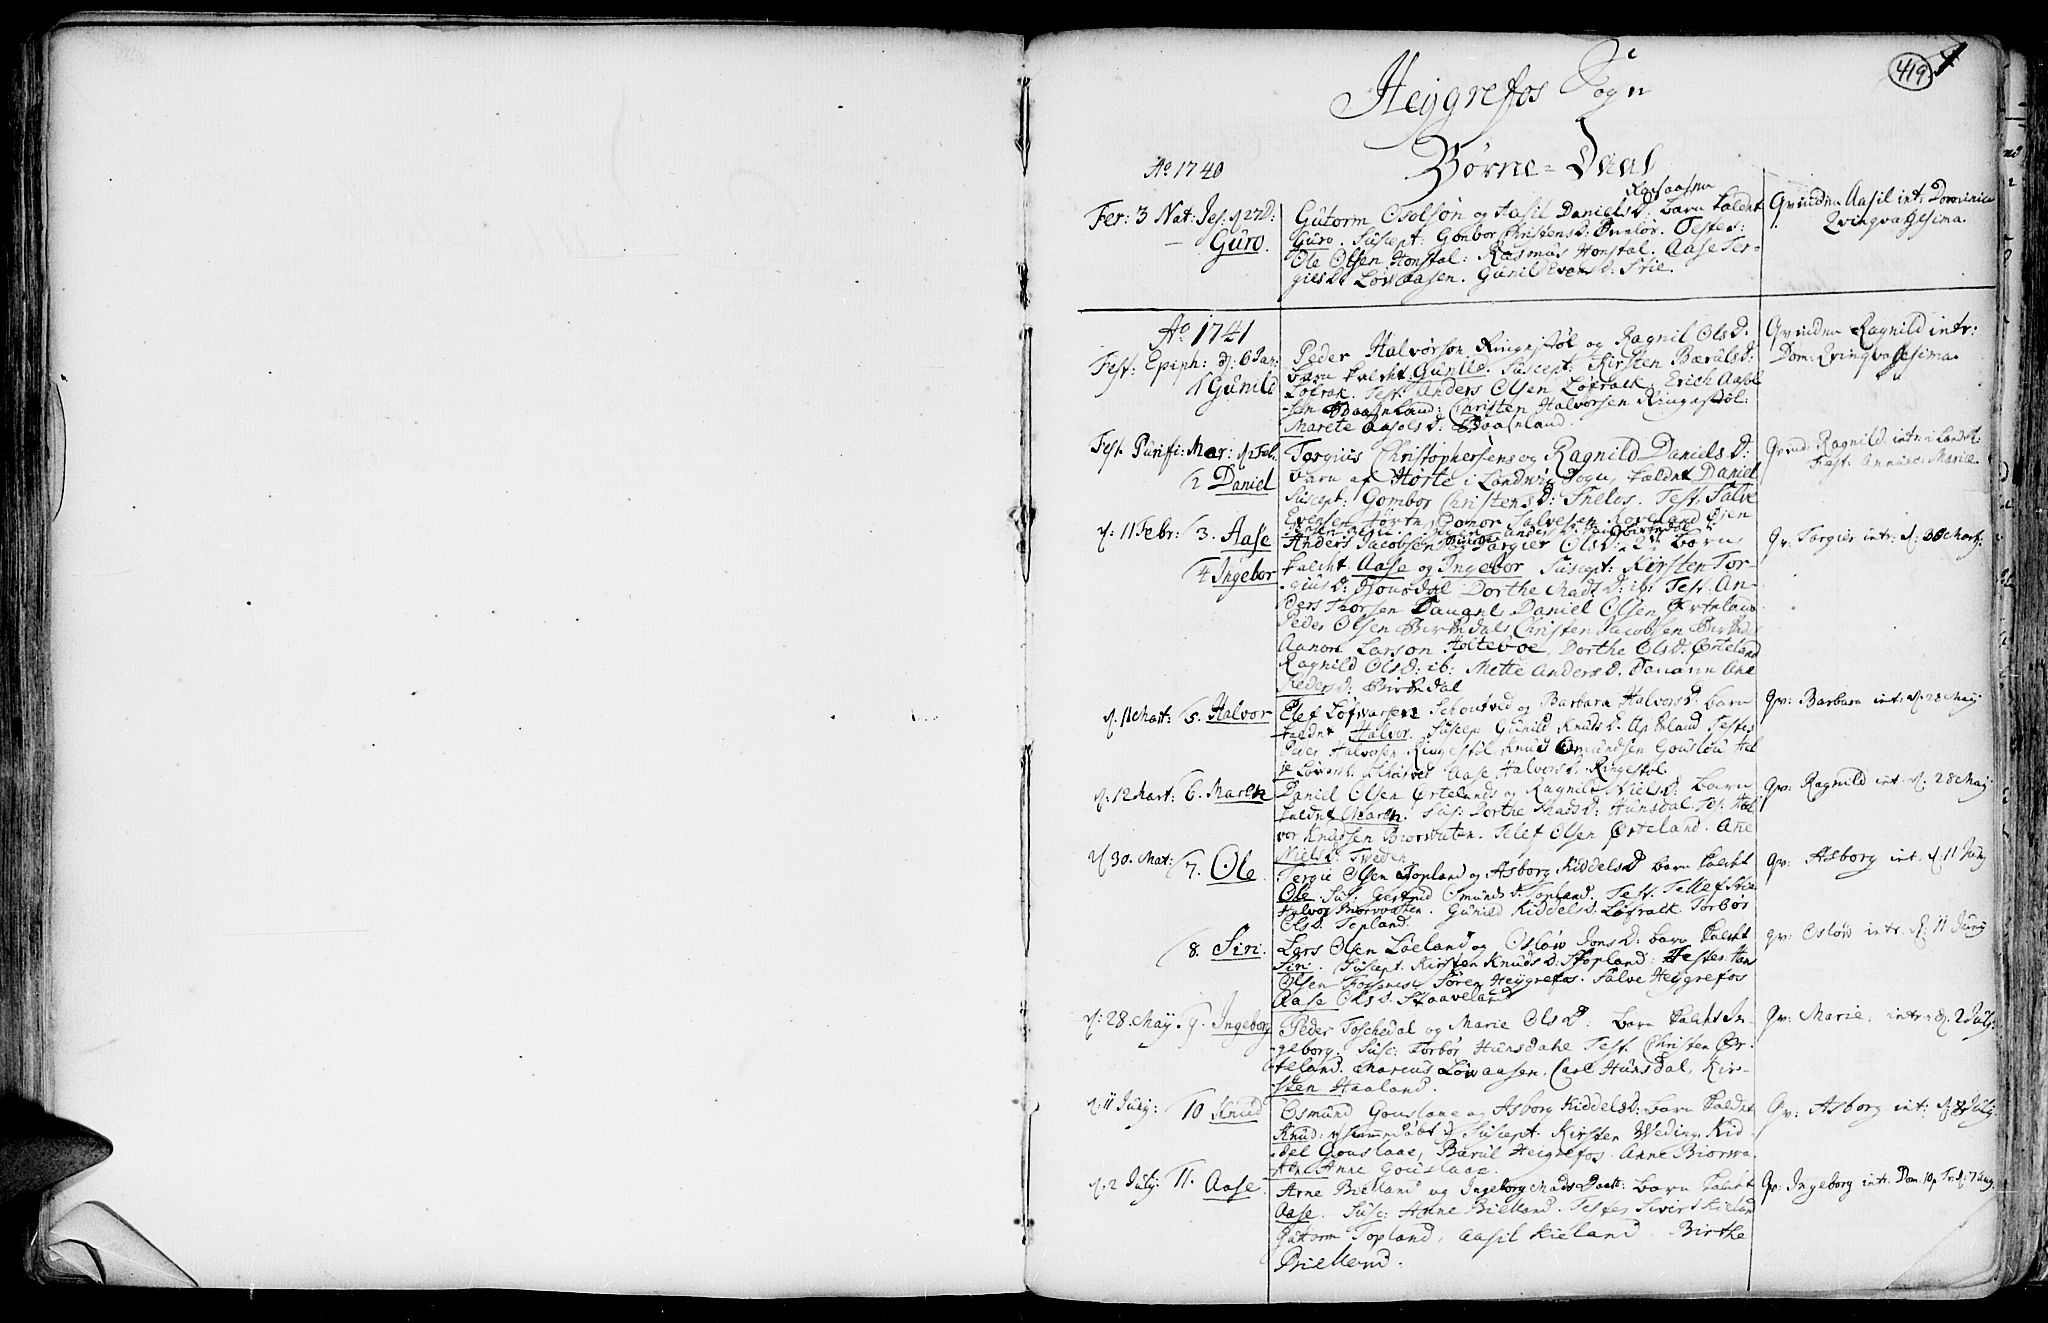 SAK, Hommedal sokneprestkontor, F/Fa/Fab/L0002: Ministerialbok nr. A 2 /3, 1740-1821, s. 419